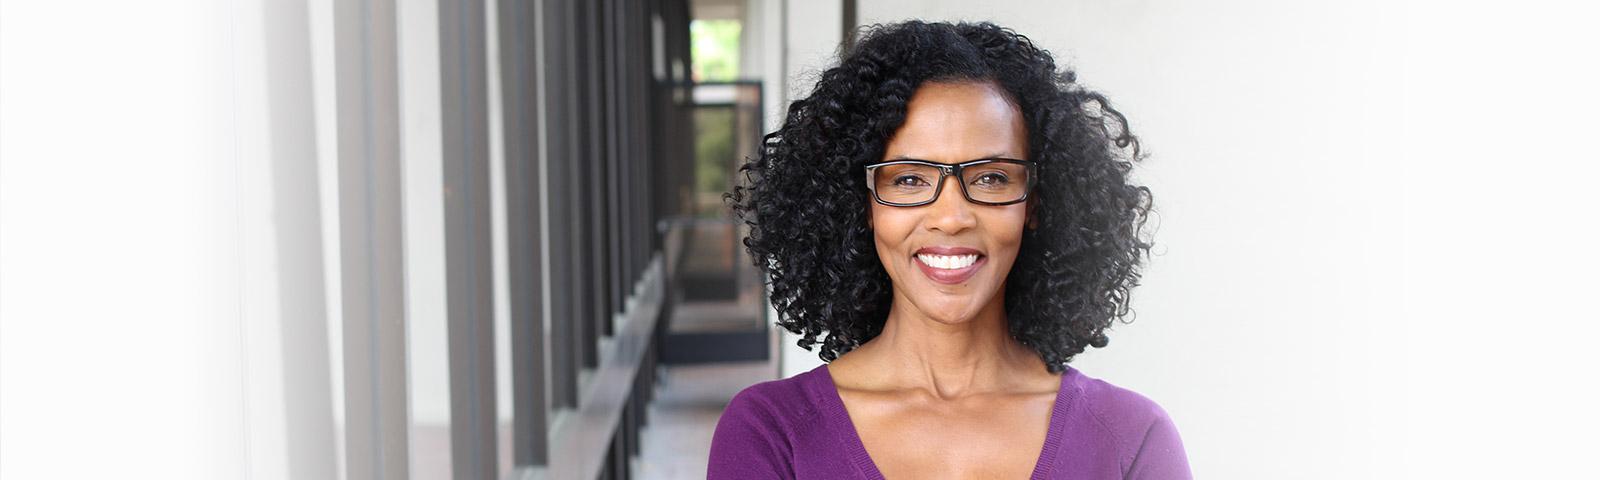 Beautiful black dating woman